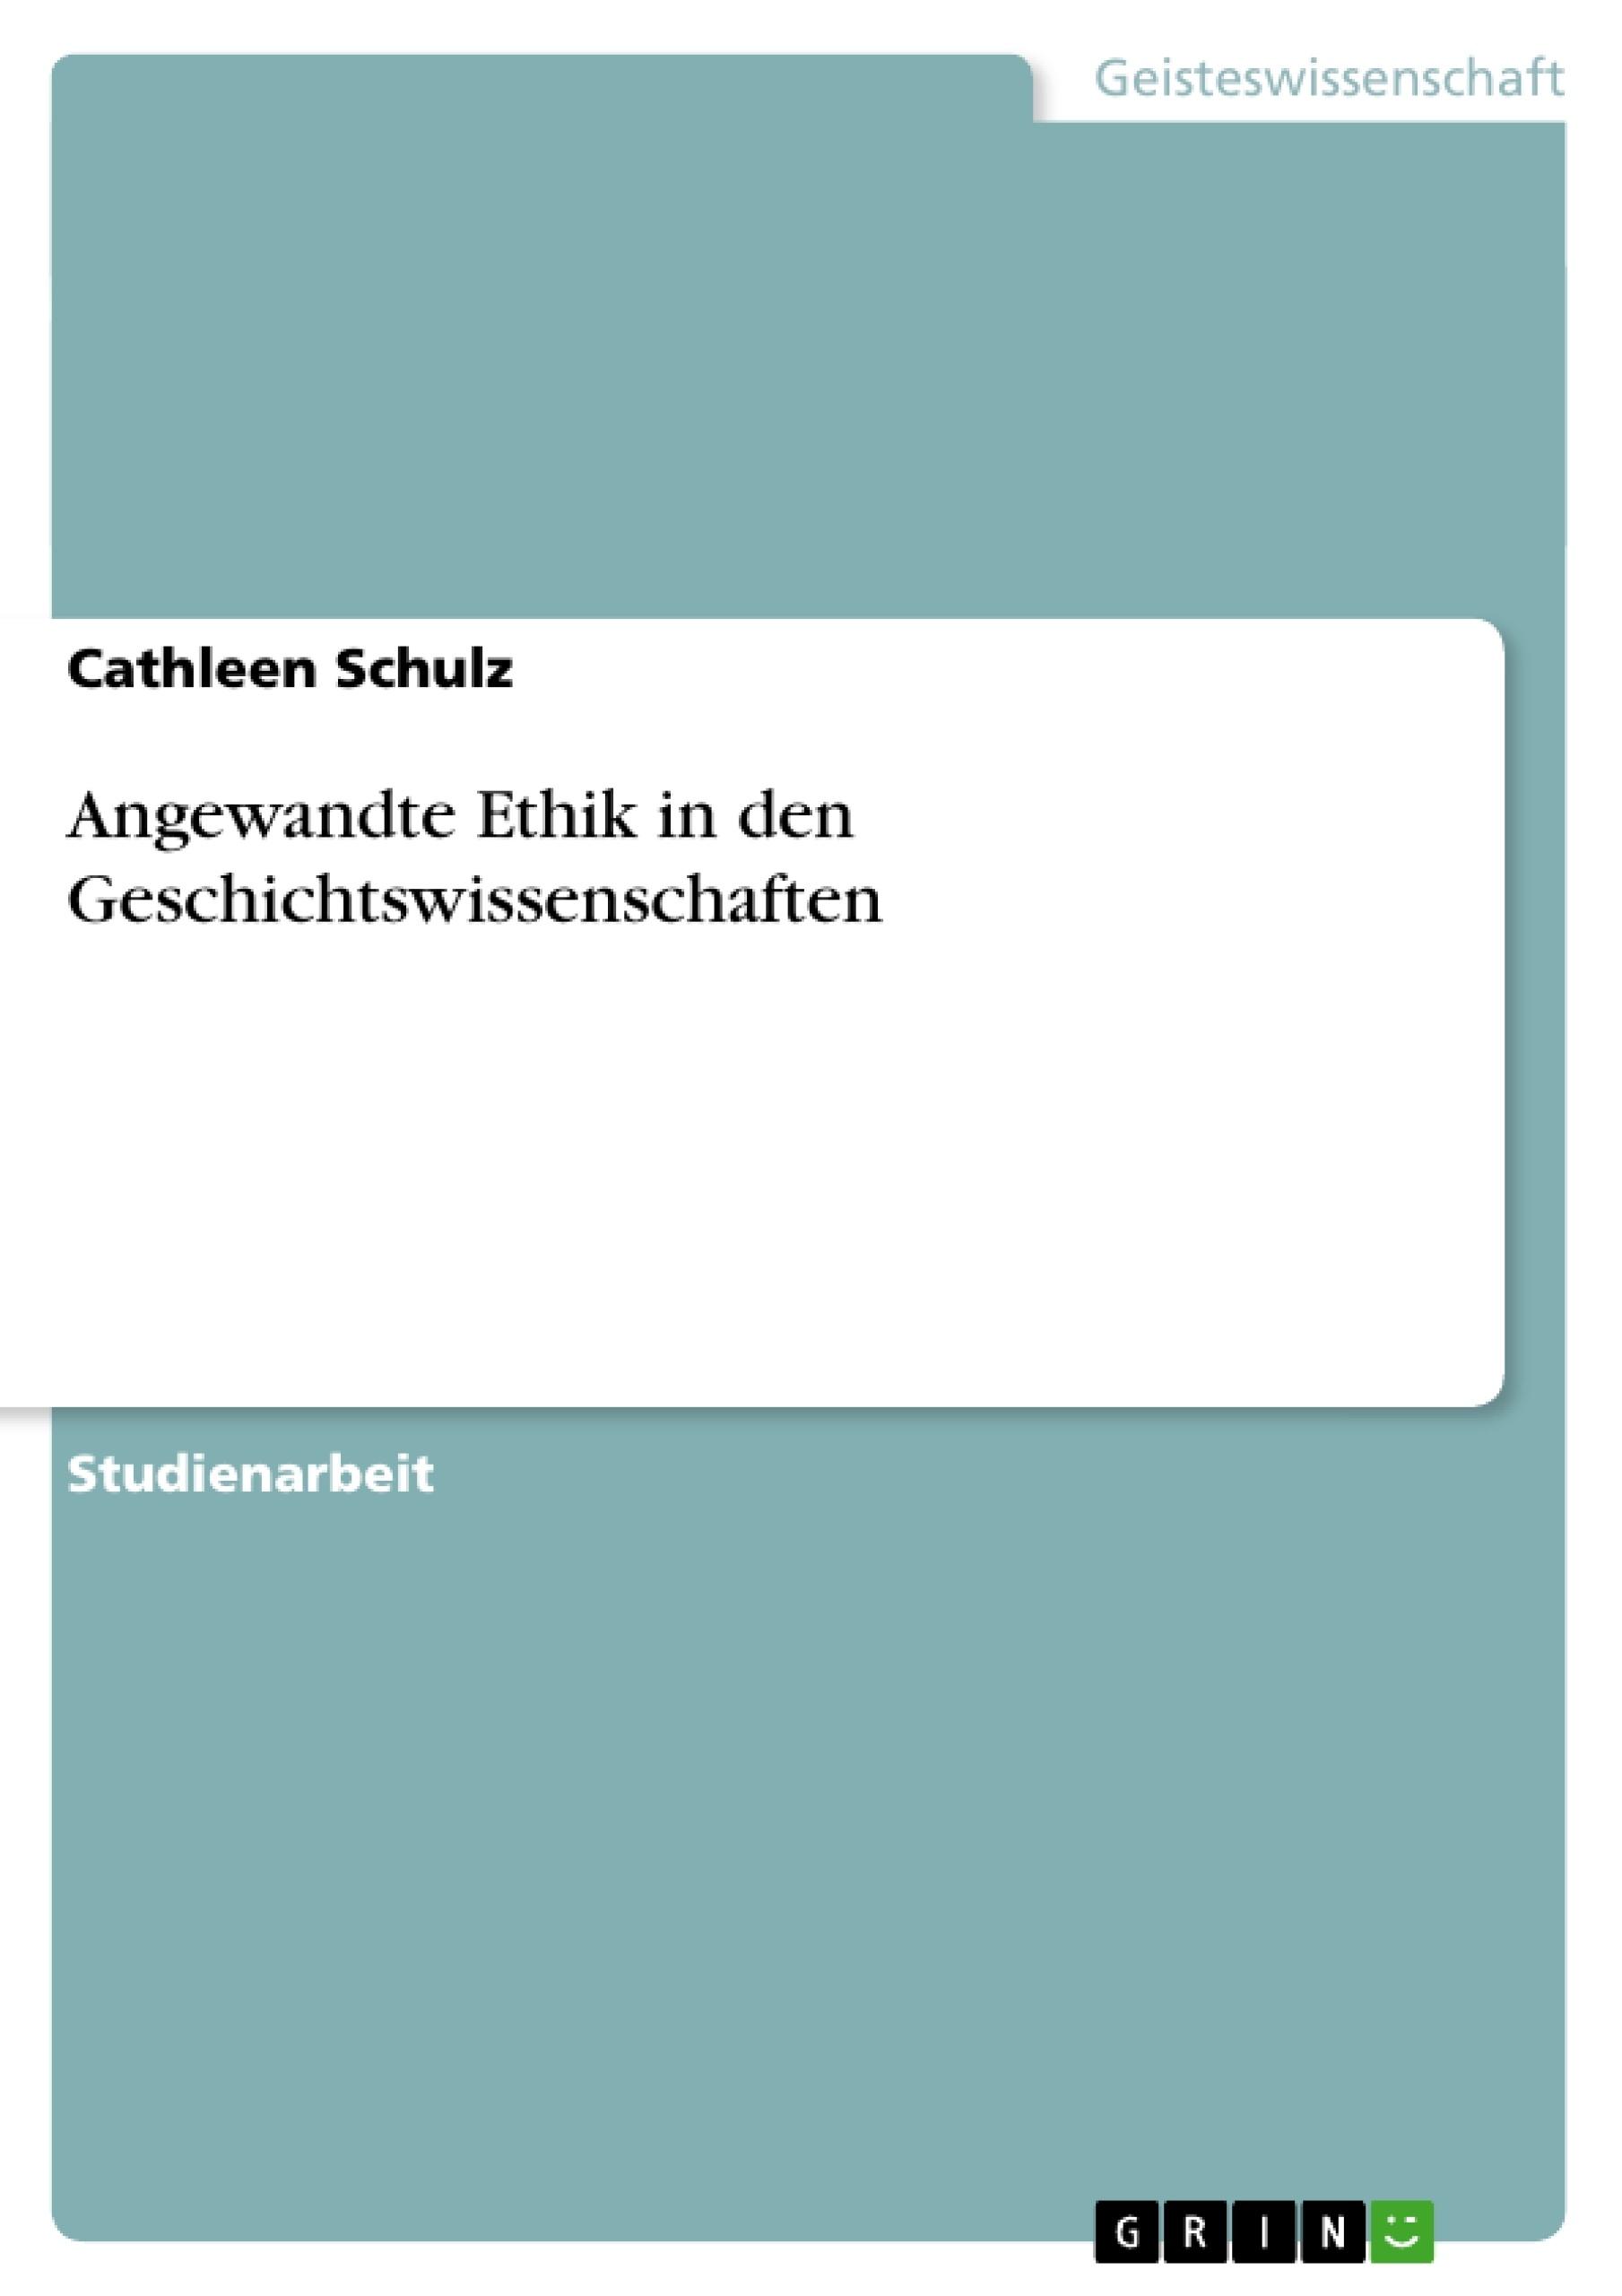 Titel: Angewandte Ethik in den Geschichtswissenschaften